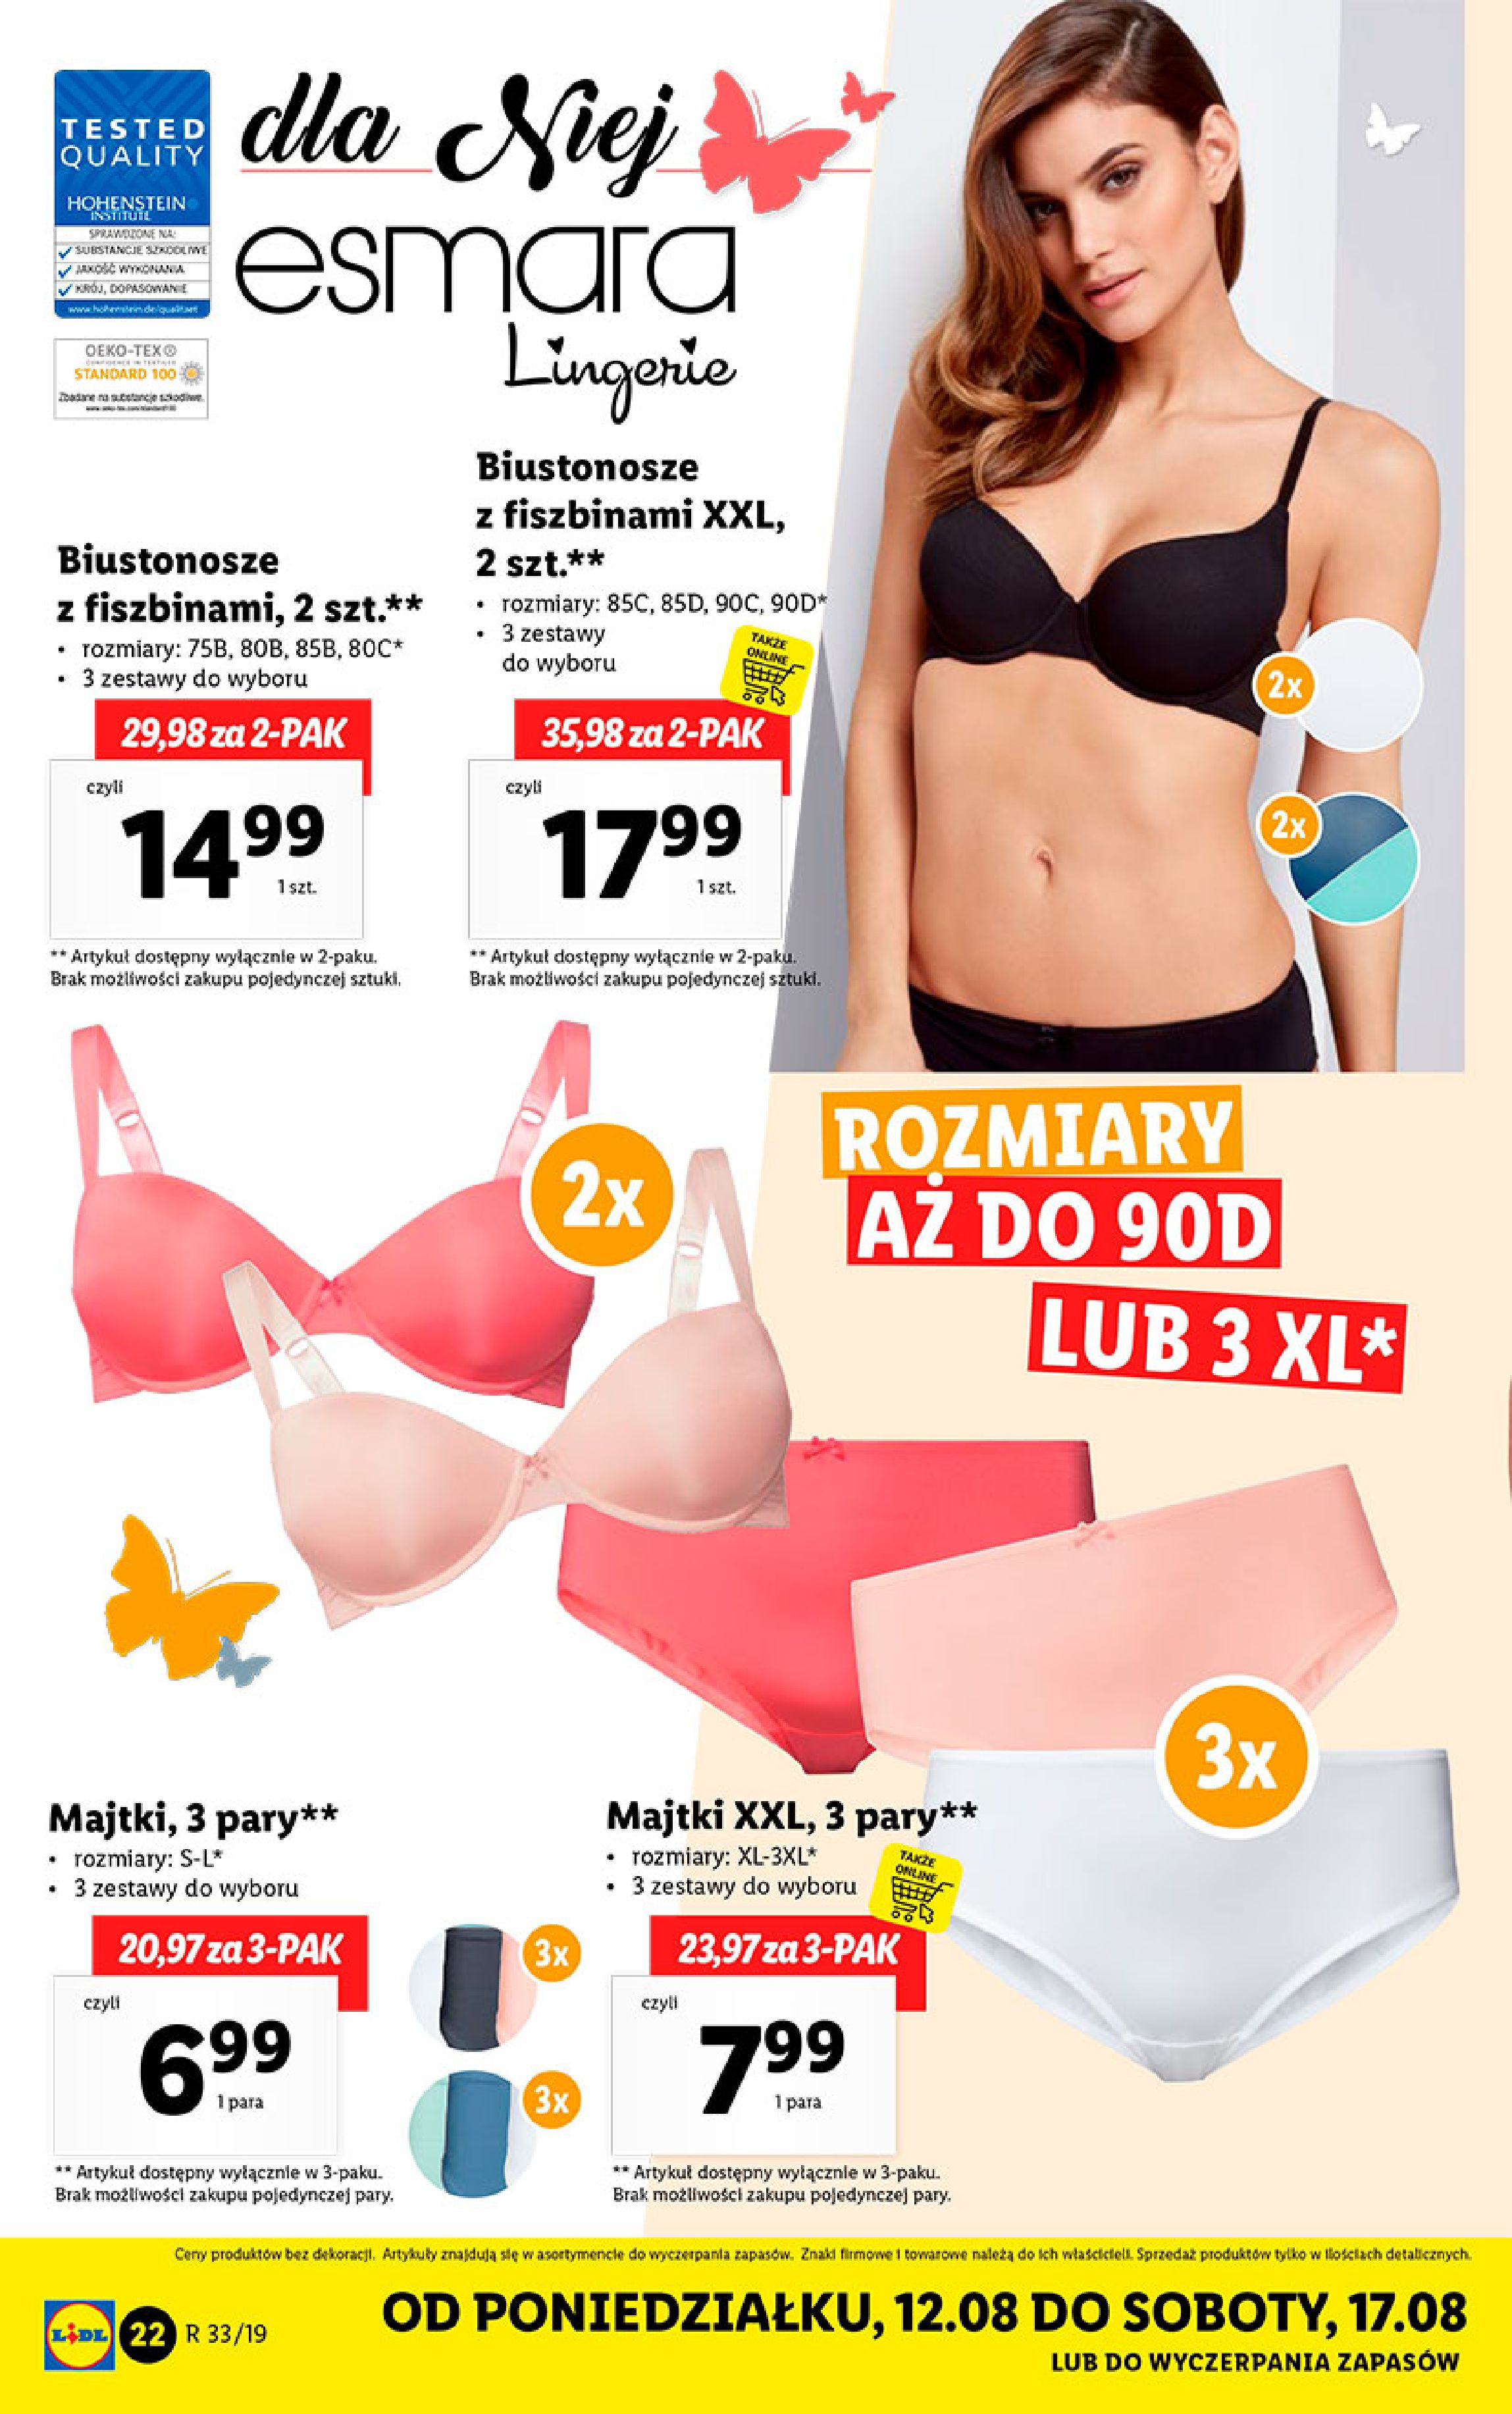 Gazetka Lidl - Katalog-11.08.2019-17.08.2019-page-22